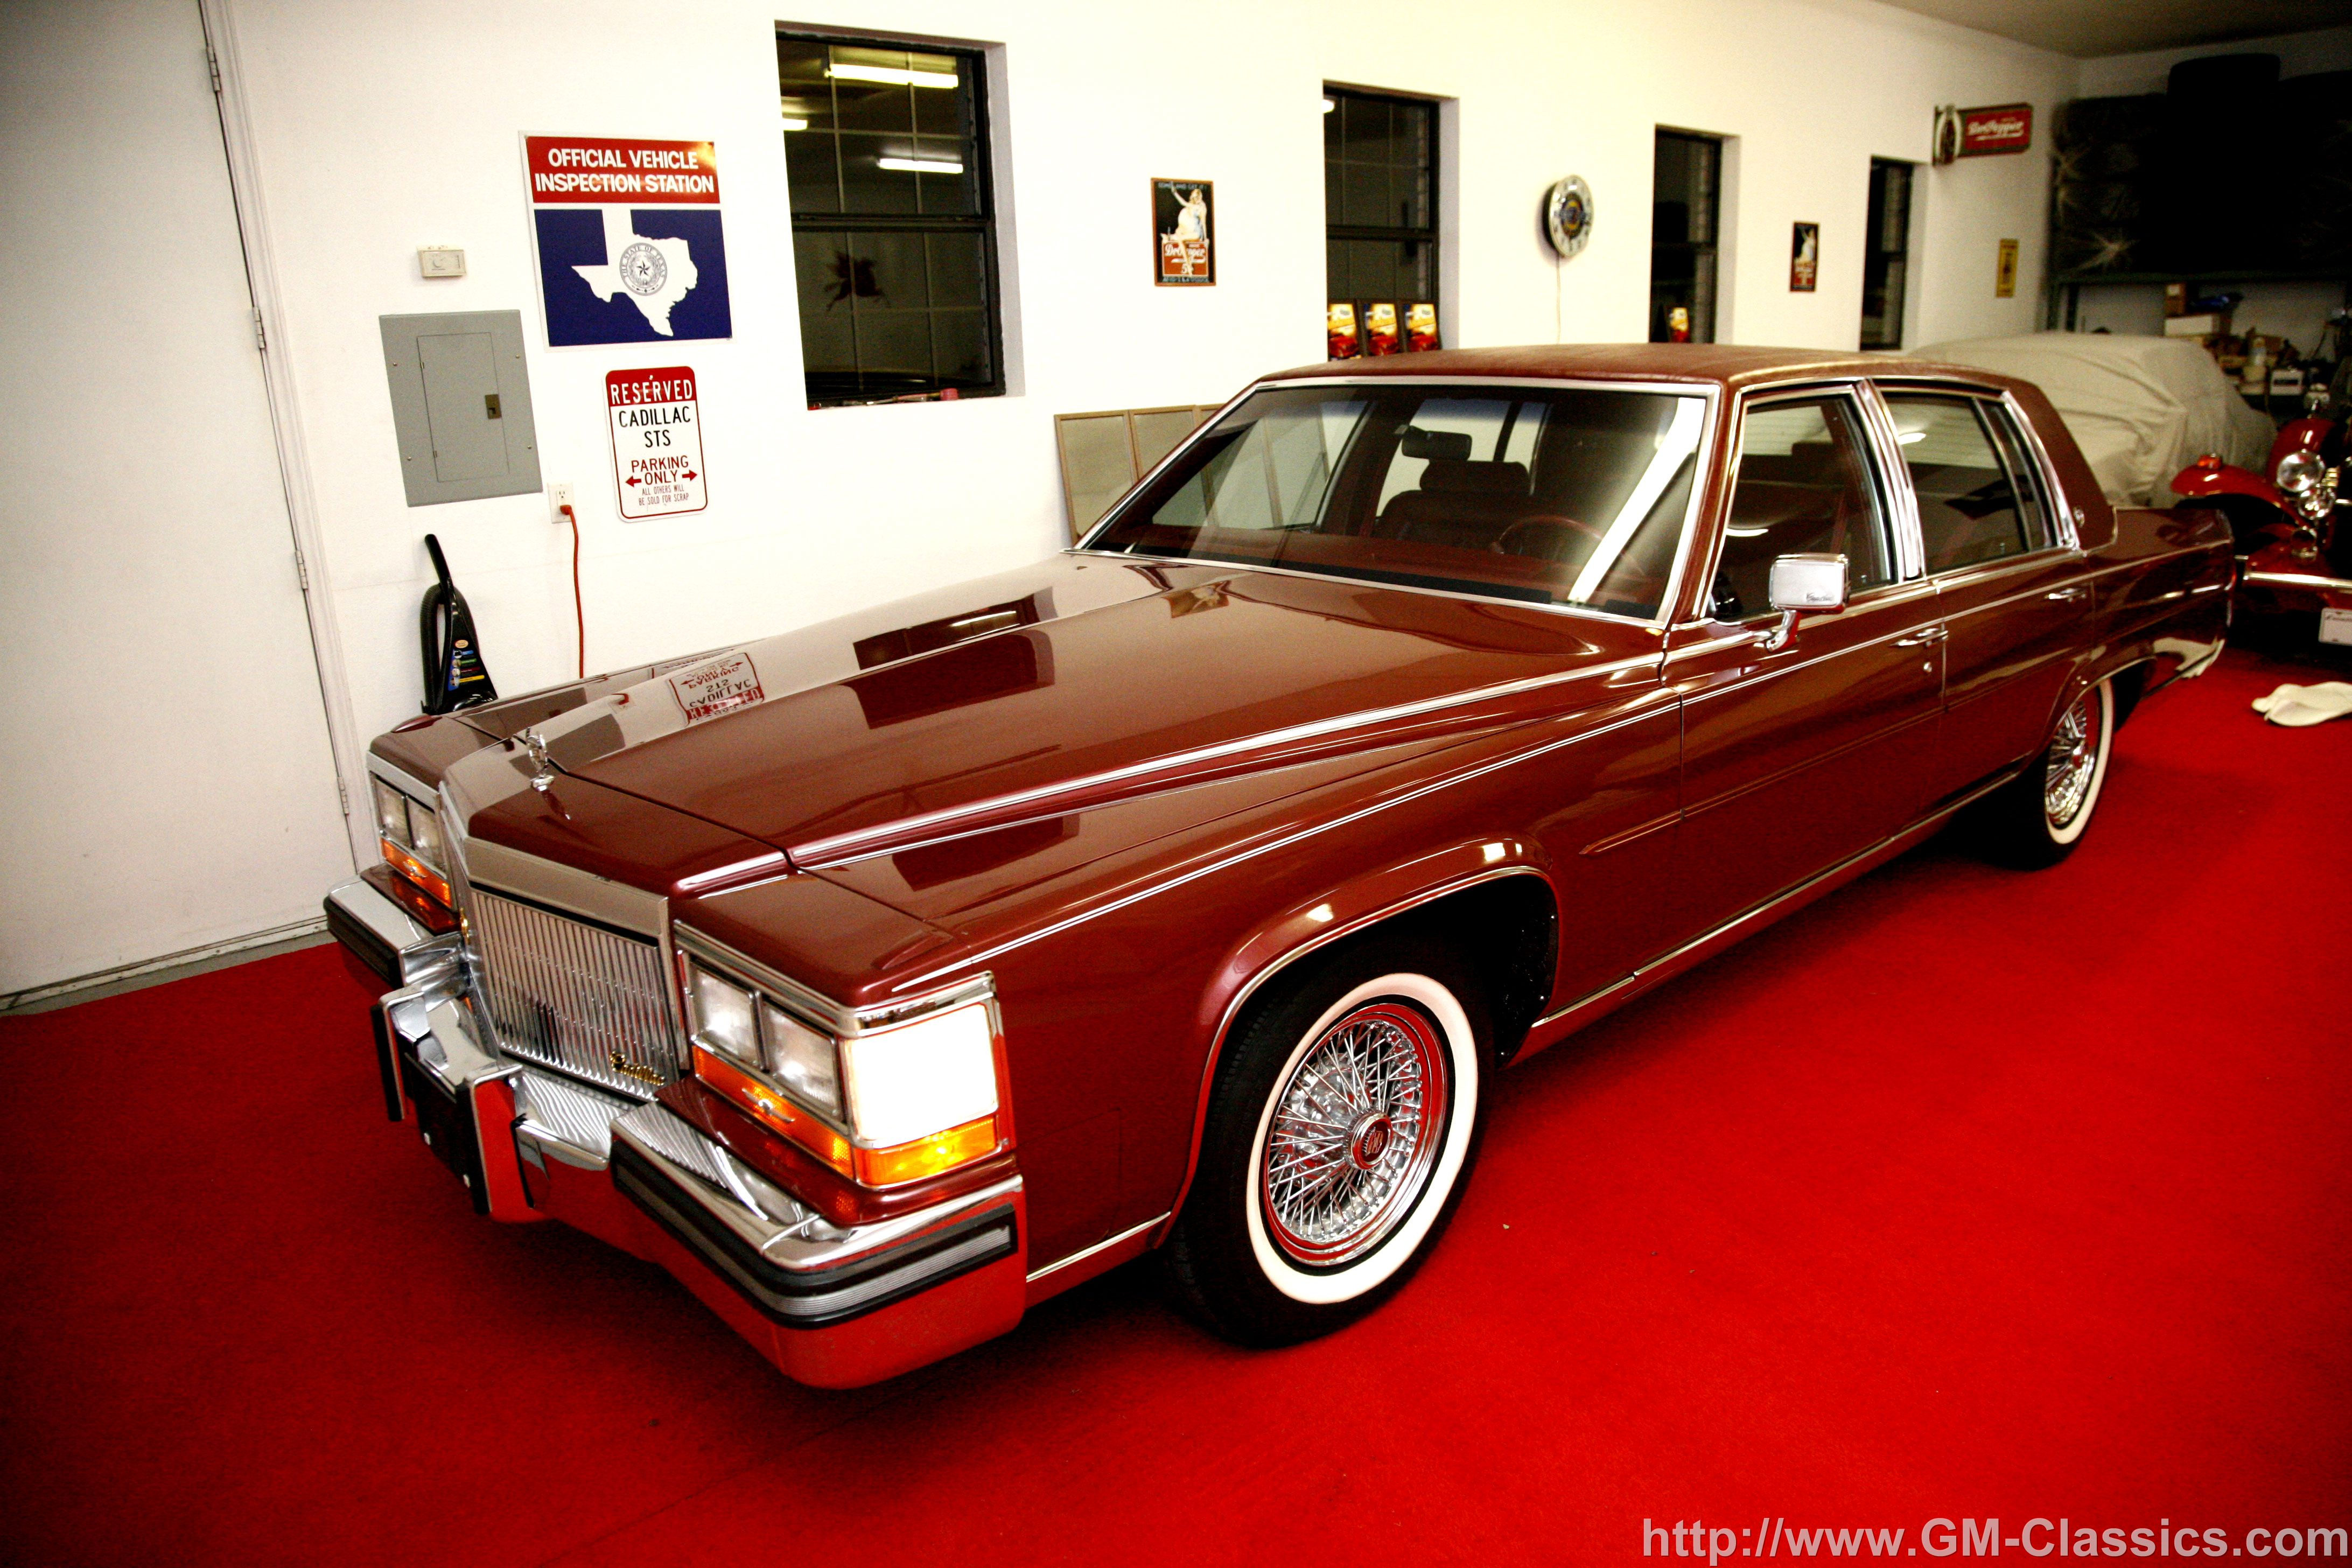 1989 Cadillac Fleetwood Brougham - Matt Garrett